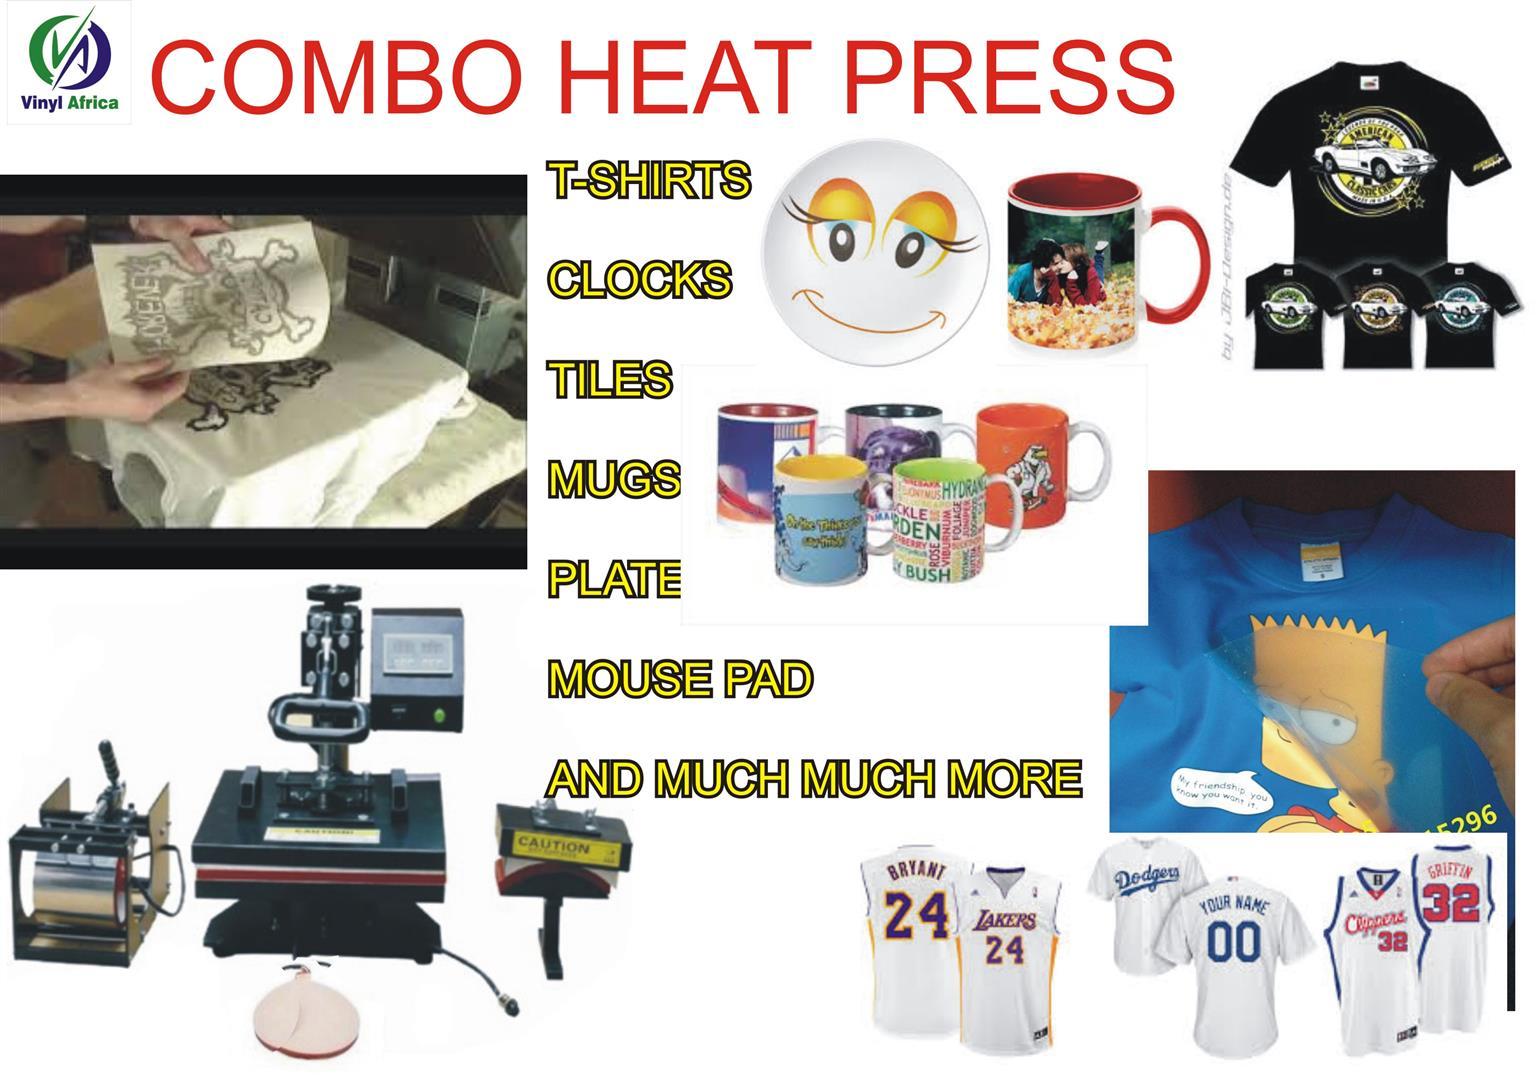 COMBO HEAT PRESS.